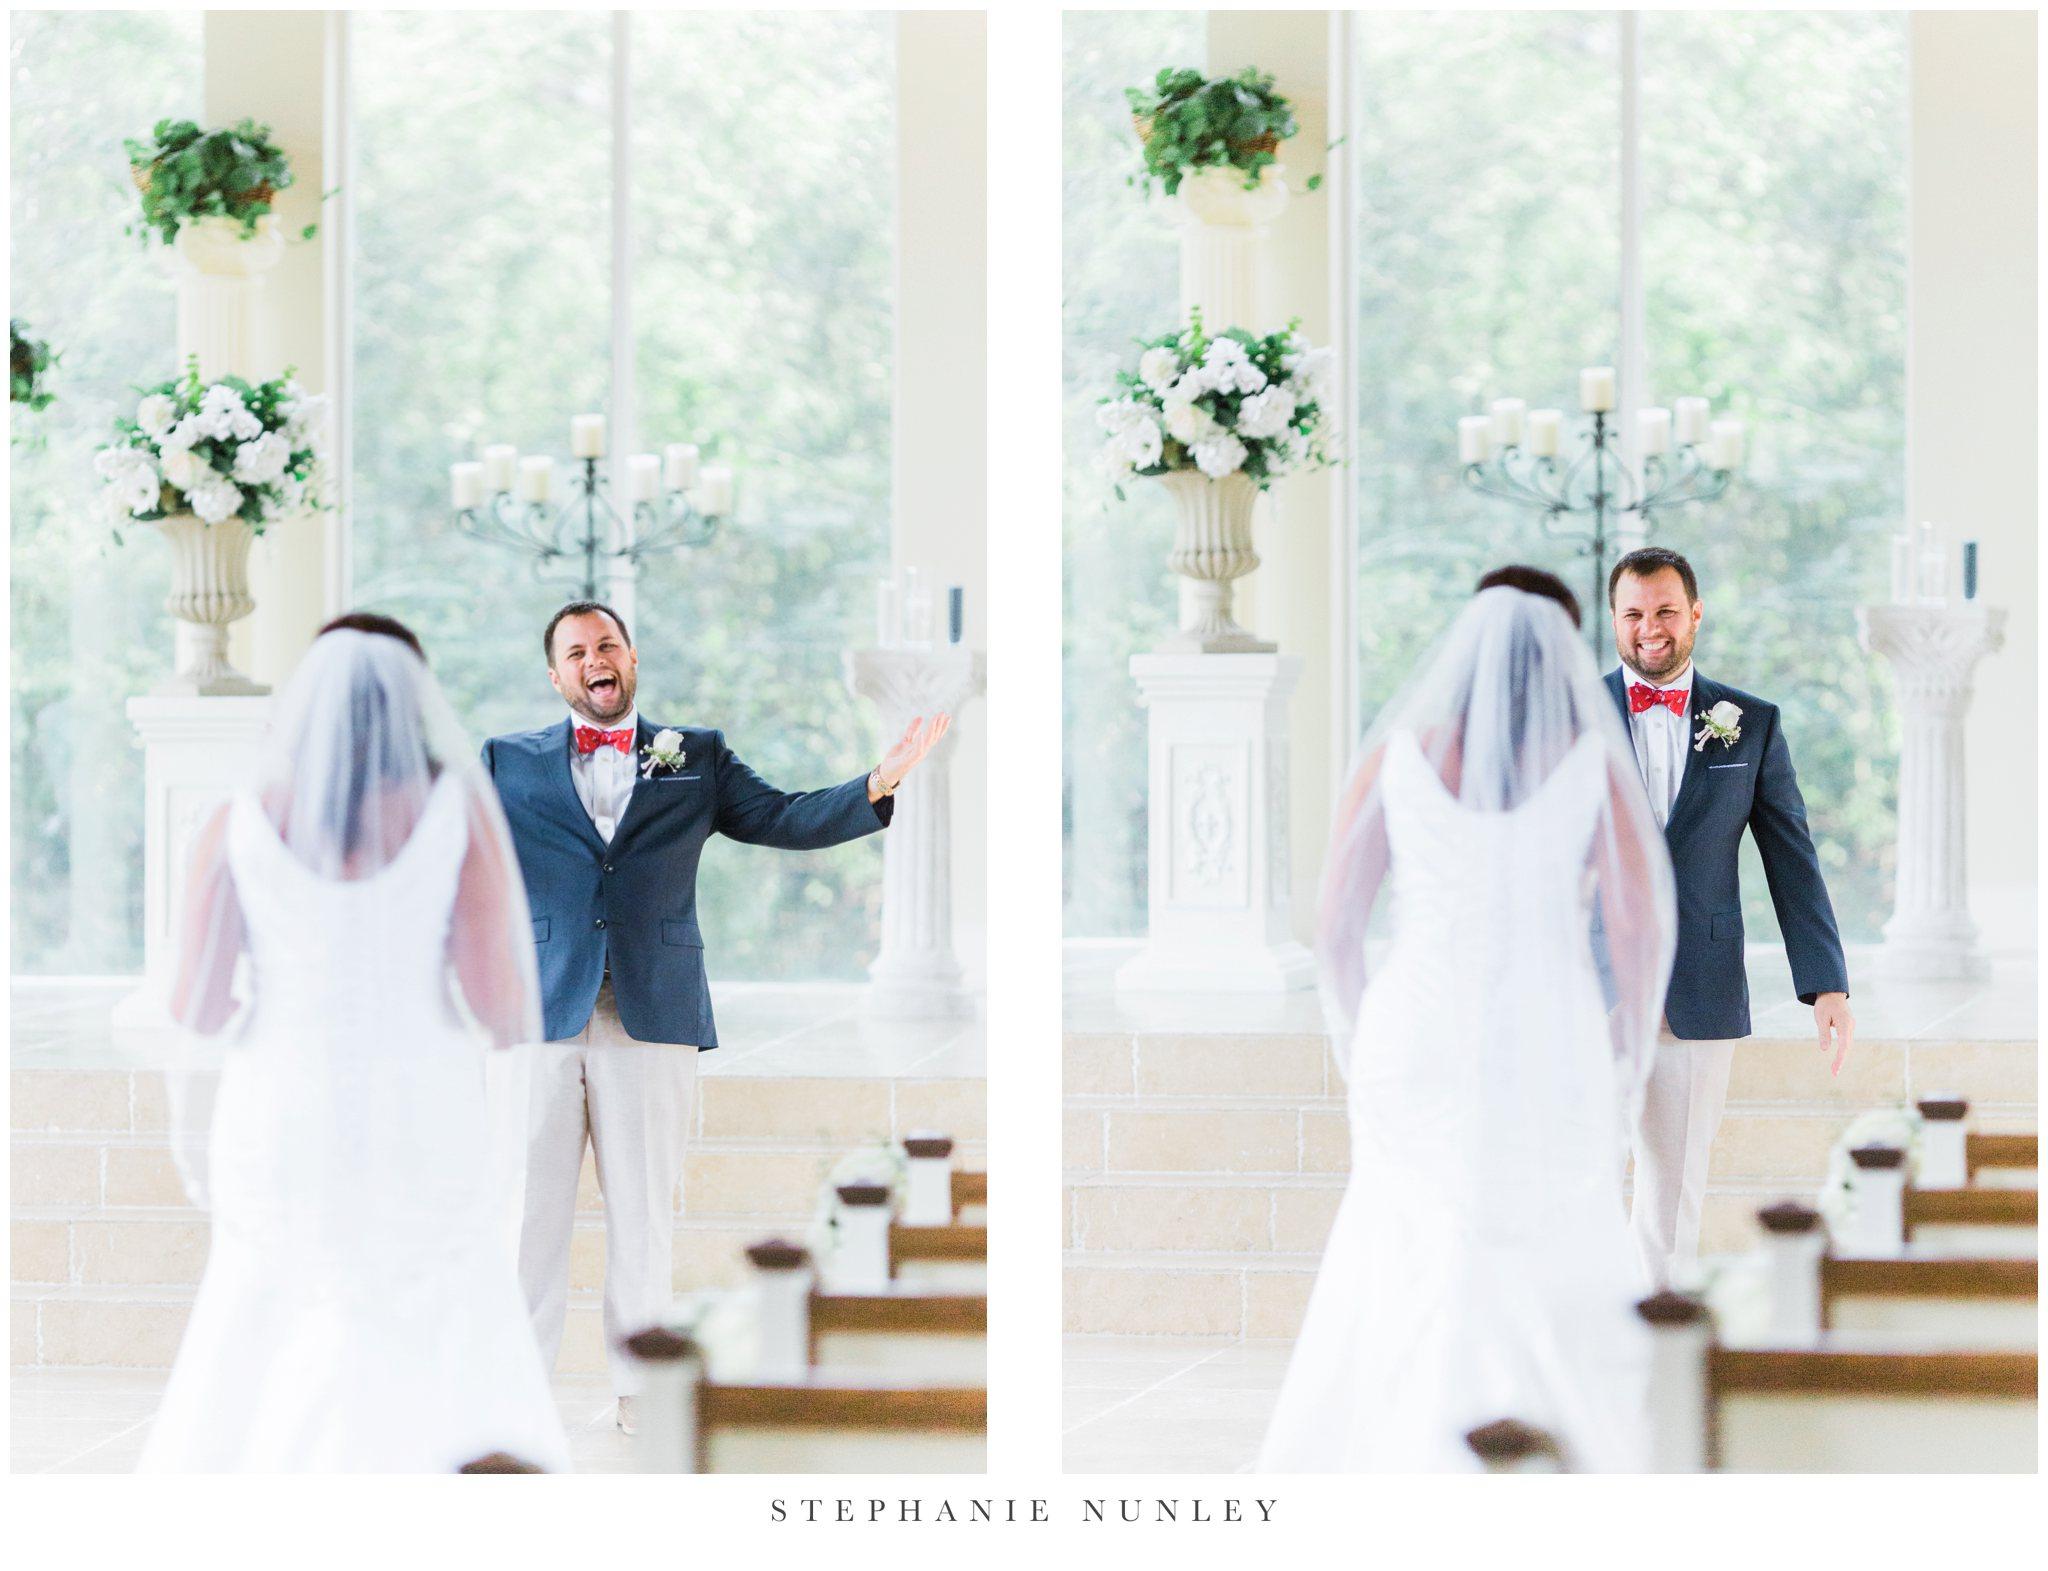 glass-chapel-wedding-photos-0027.jpg